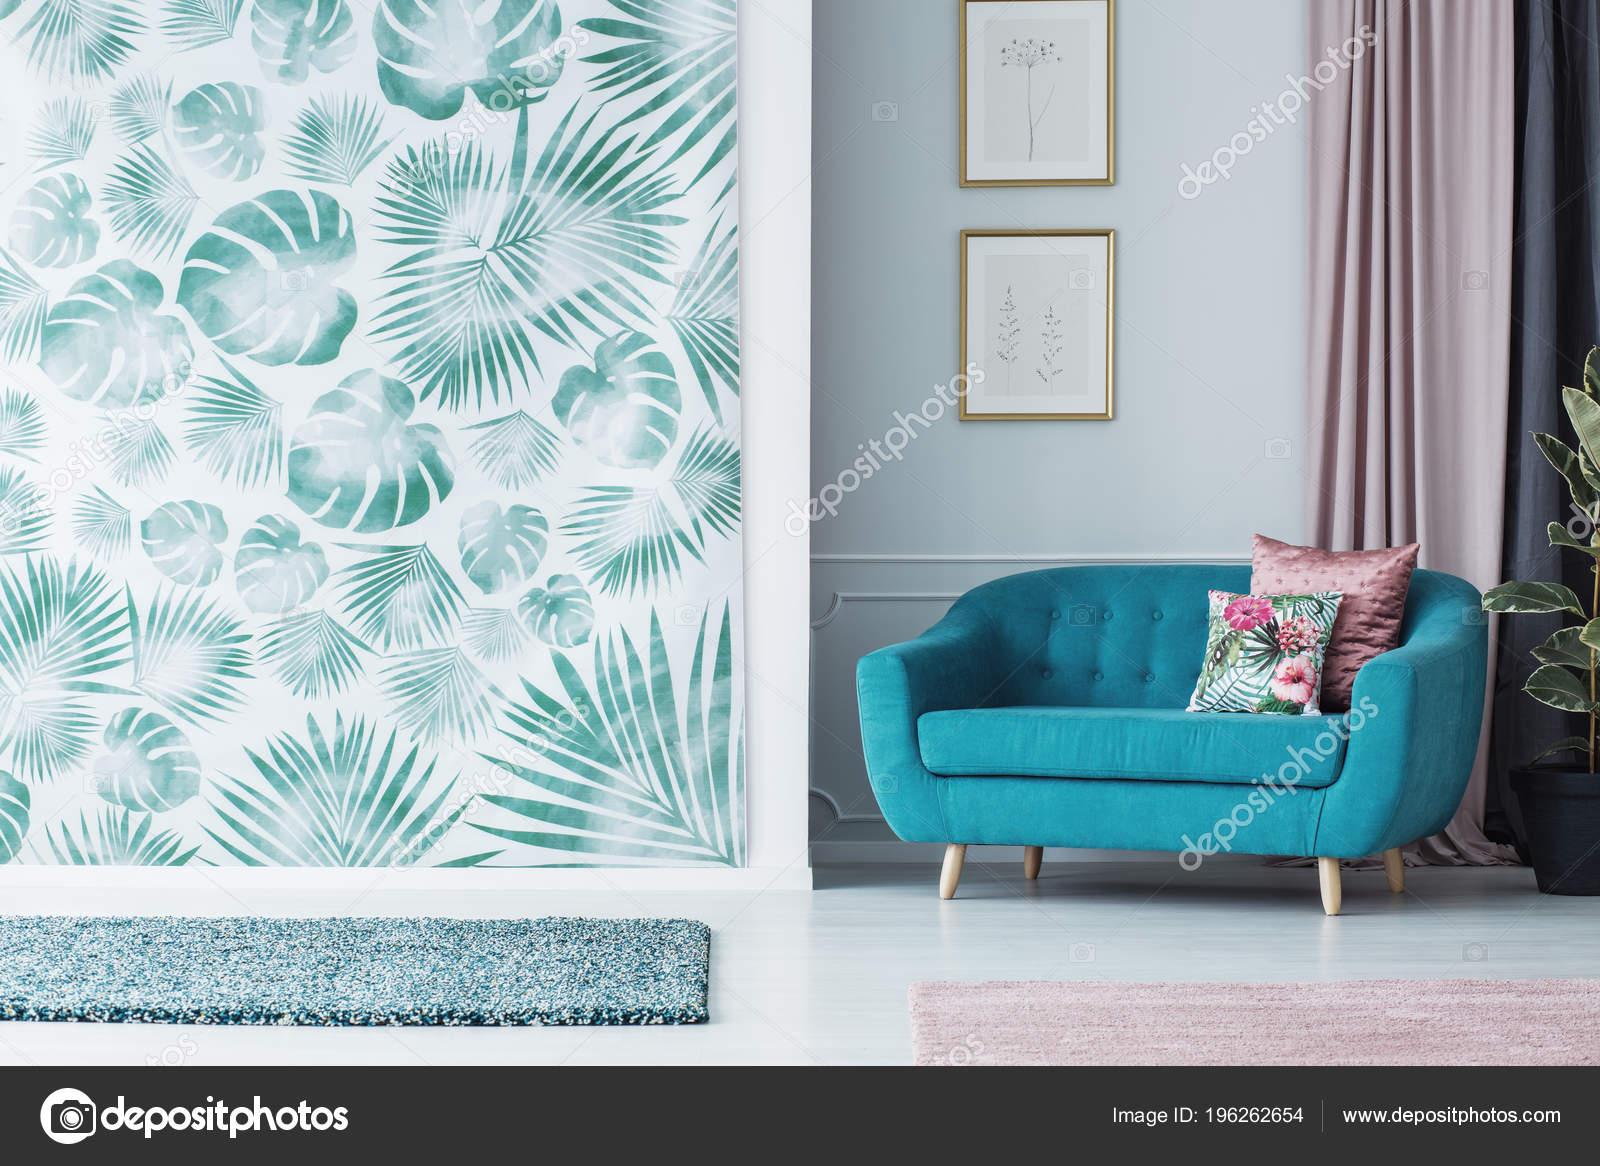 Turquoise Bank Lommerrijke Woonkamer Interieur Met Groene Behang ...